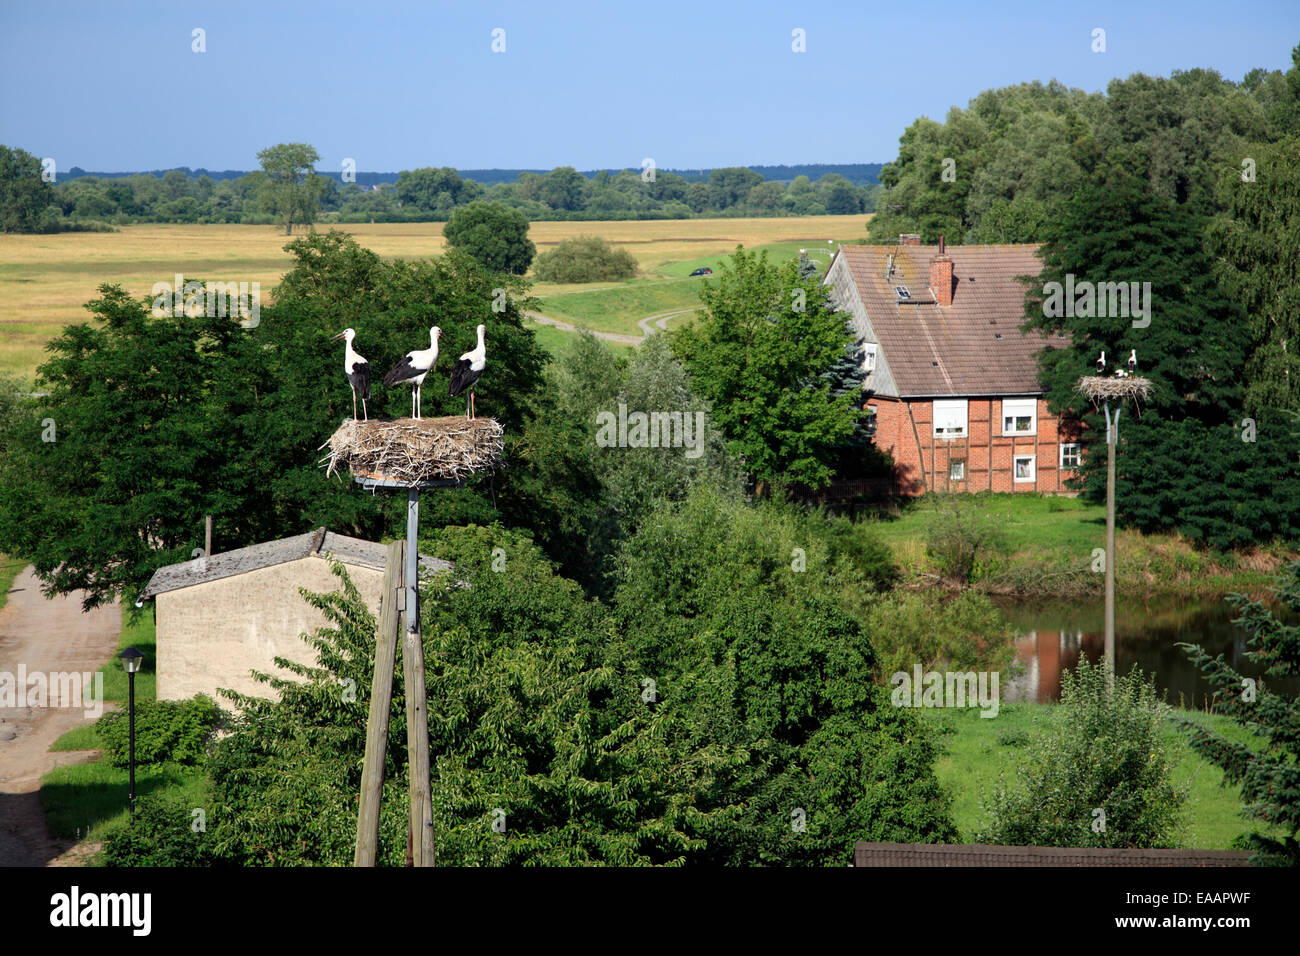 Stork nests in Werben / Elbe, Altmark, Sachsen-Anhalt, Germany, Europe Stock Photo